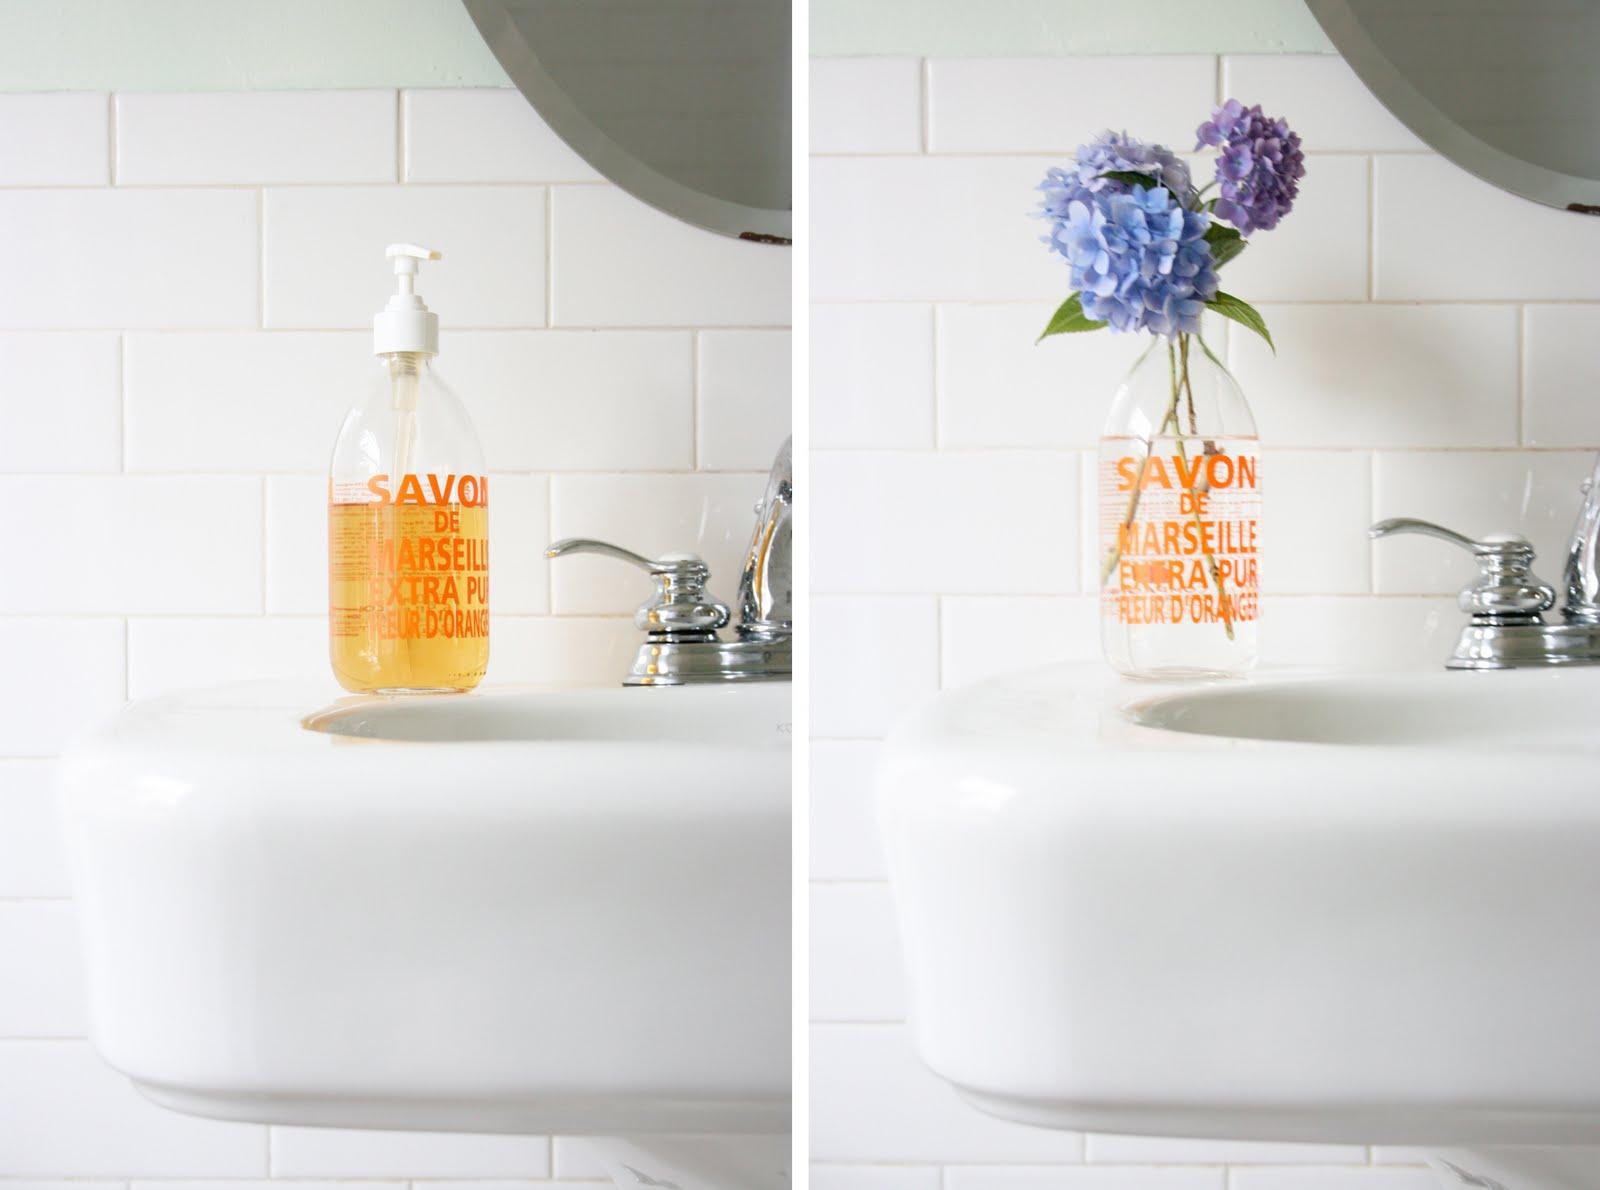 stephmodo repurposing savon de marseille. Black Bedroom Furniture Sets. Home Design Ideas